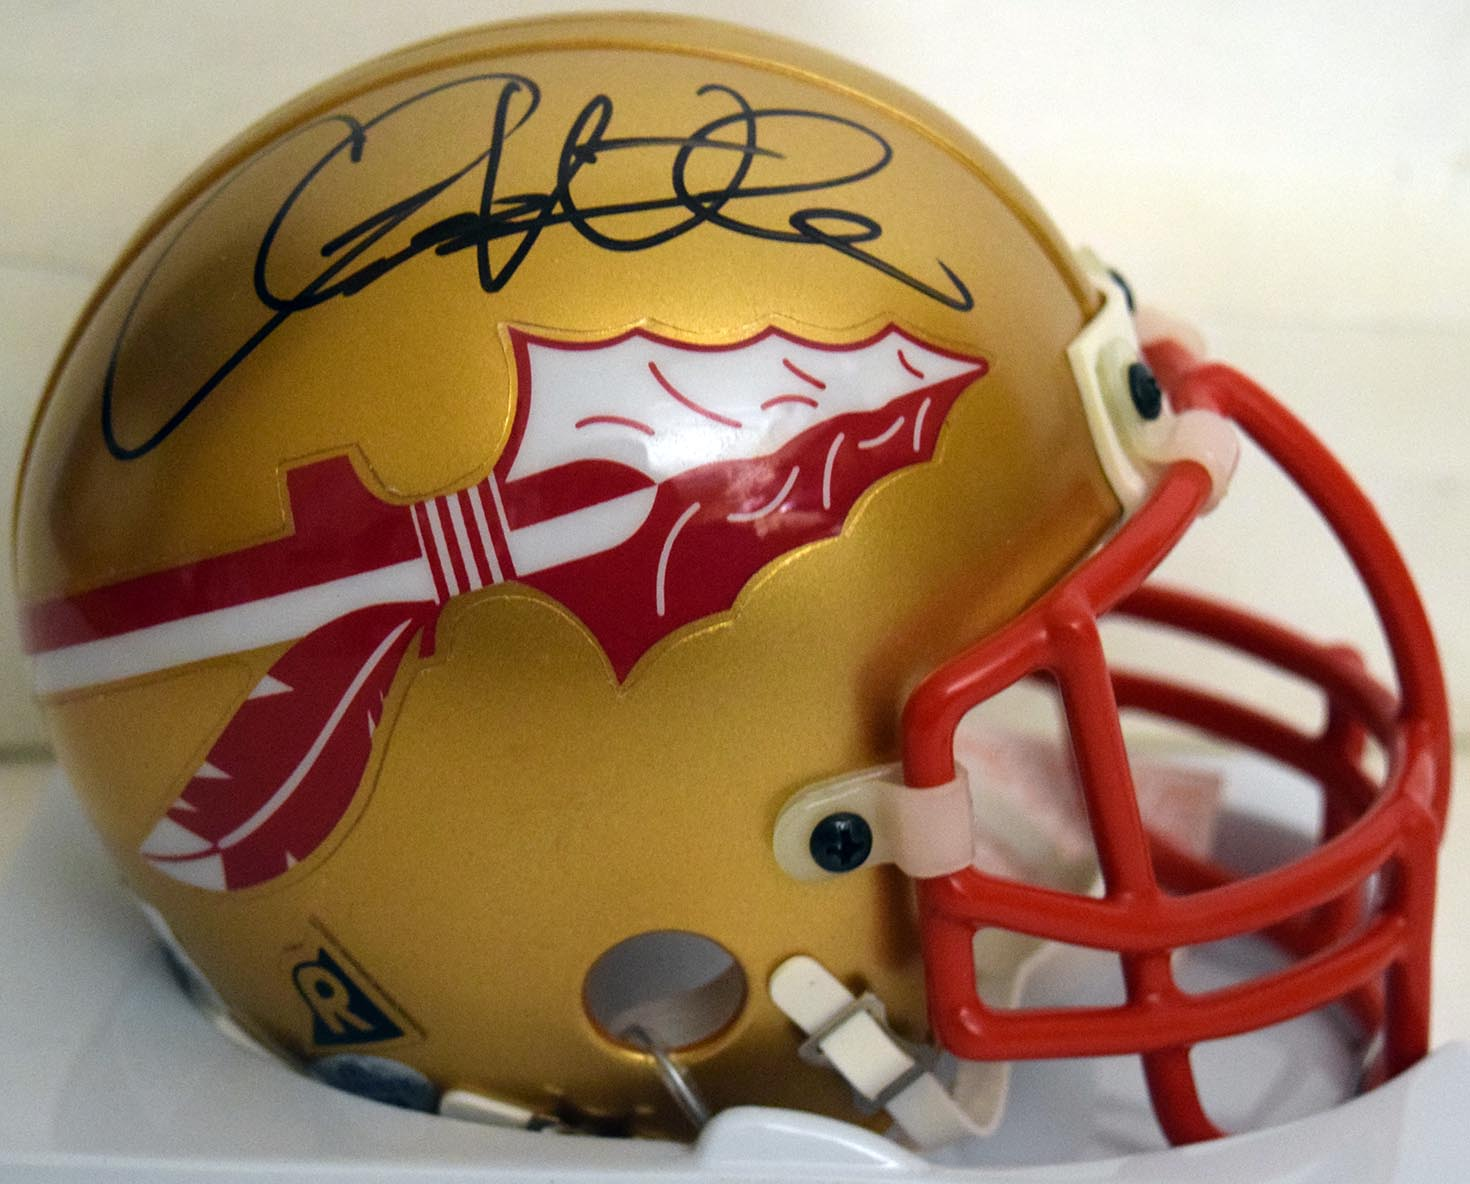 Lot #1009  Mini Helmet  Weinke, Chris (JSA LOA) Cond: 9.5